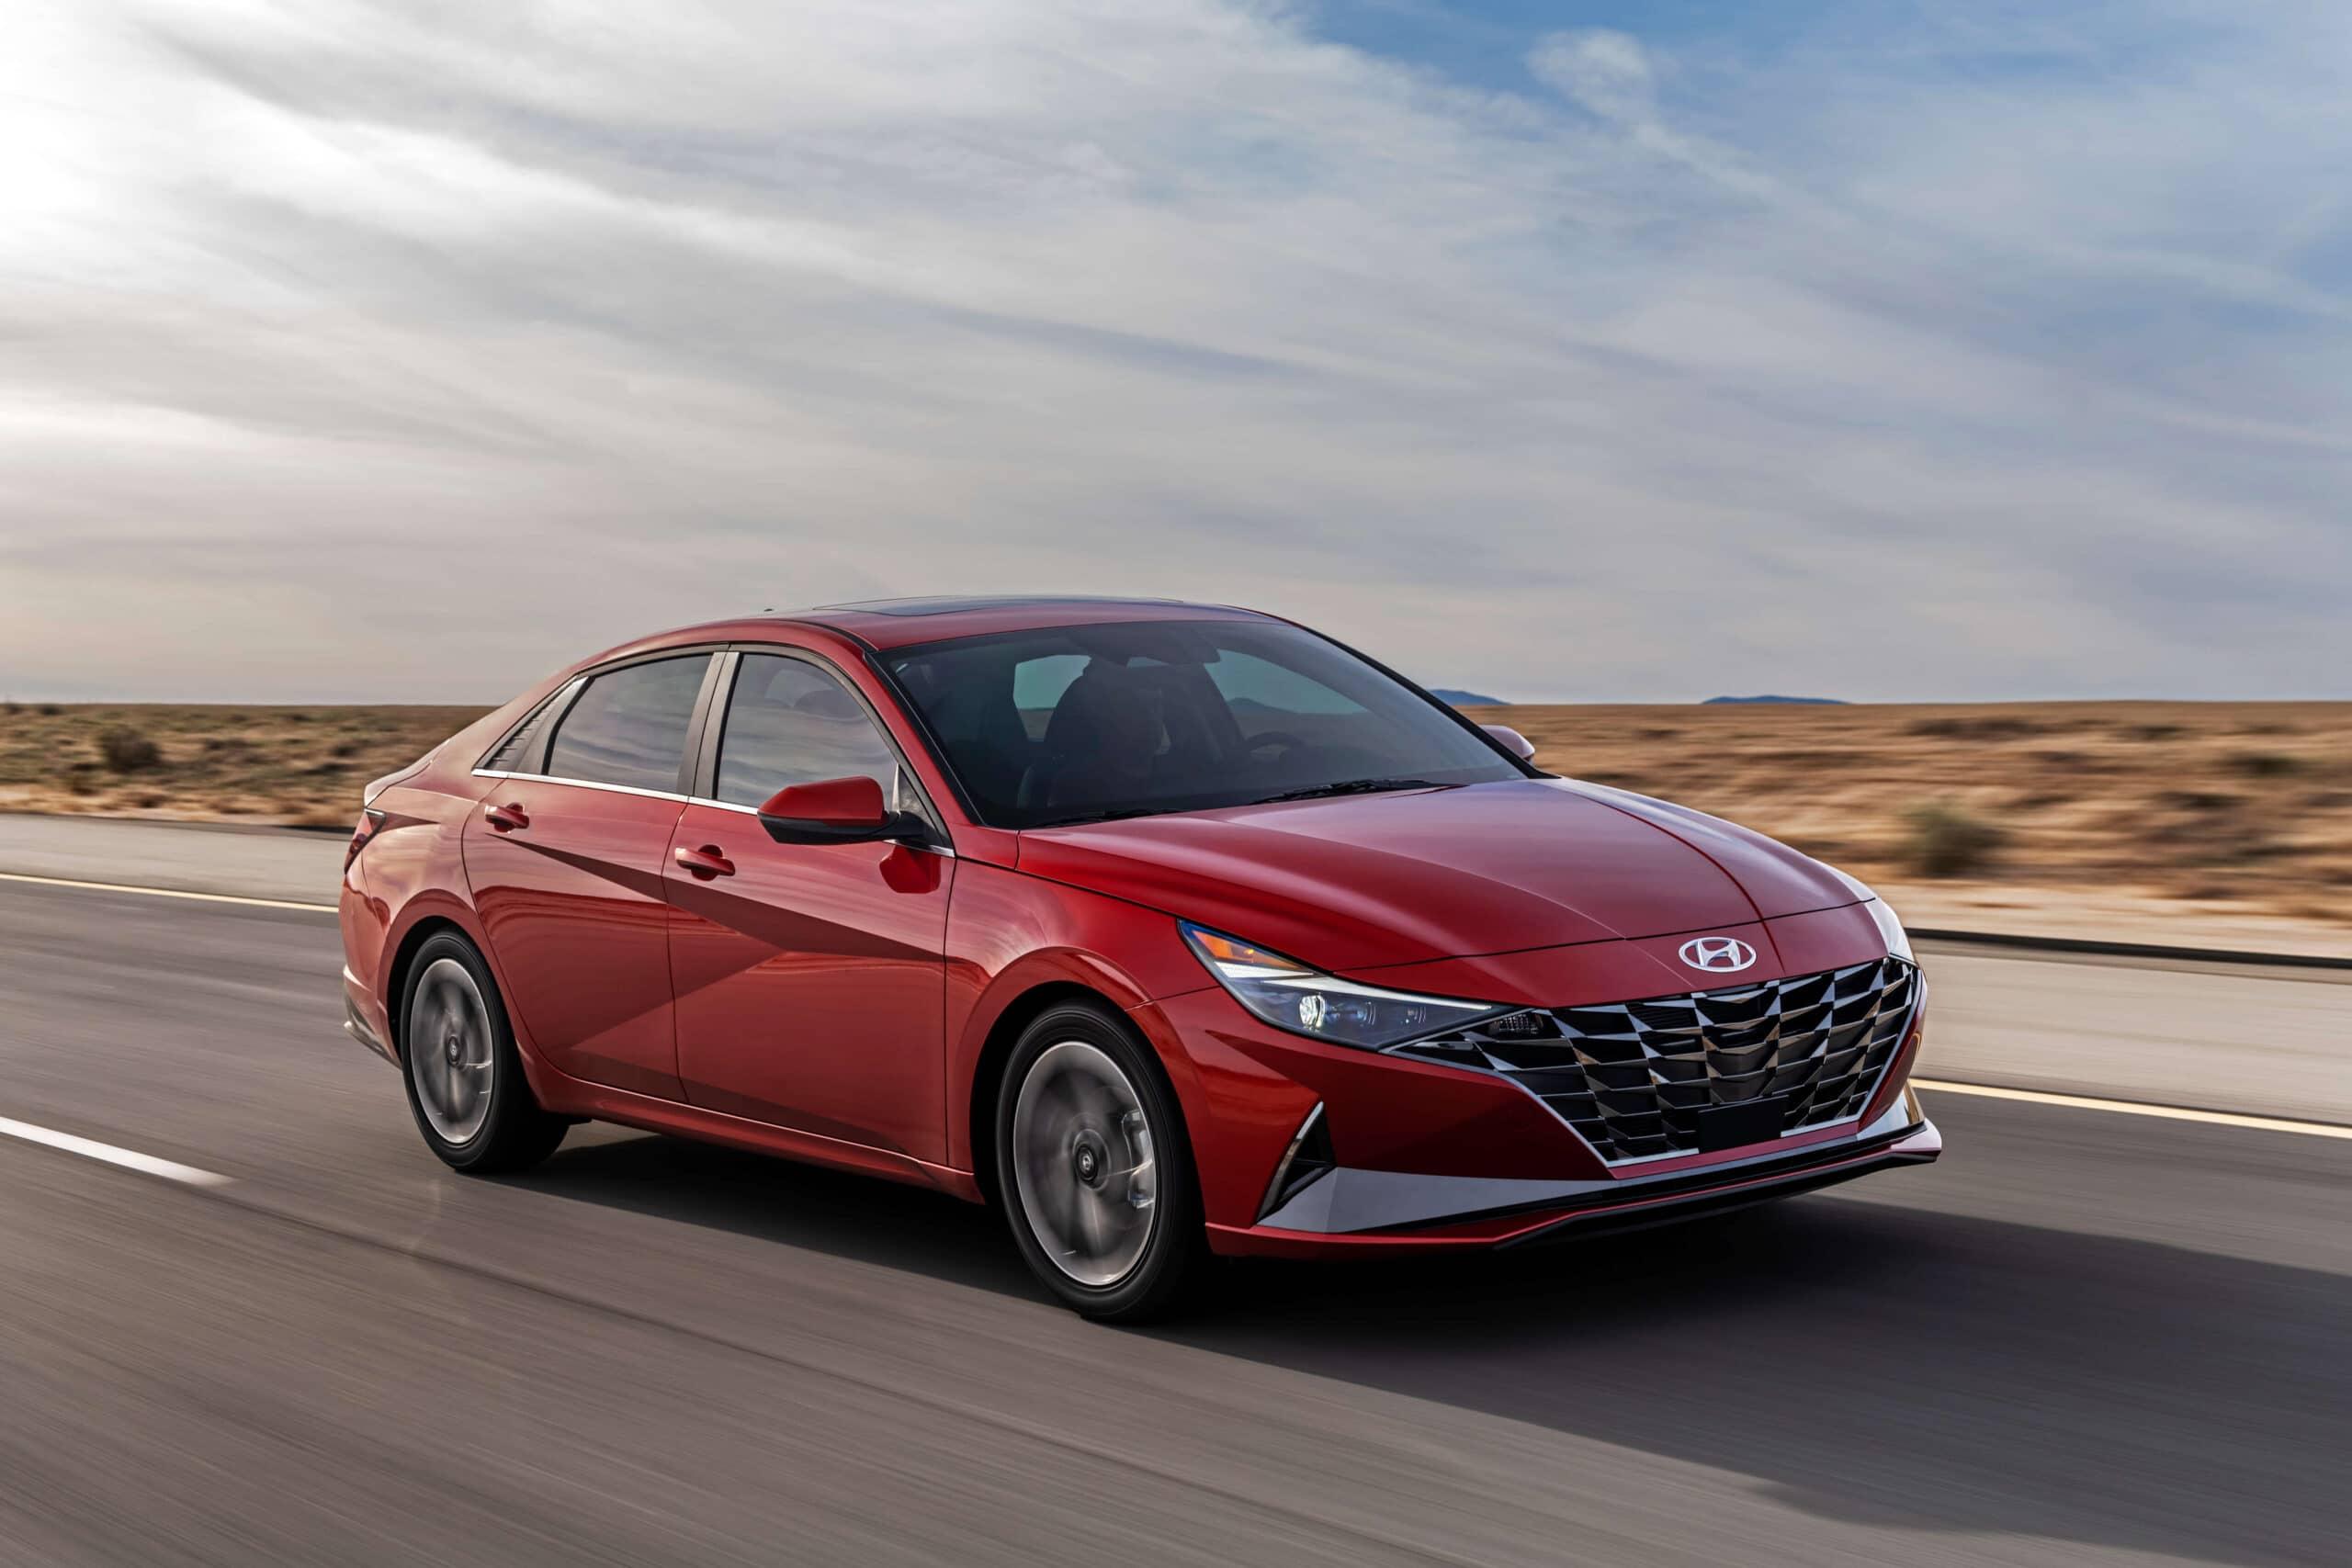 Avant de la Hyundai Elantra 2021 rouge